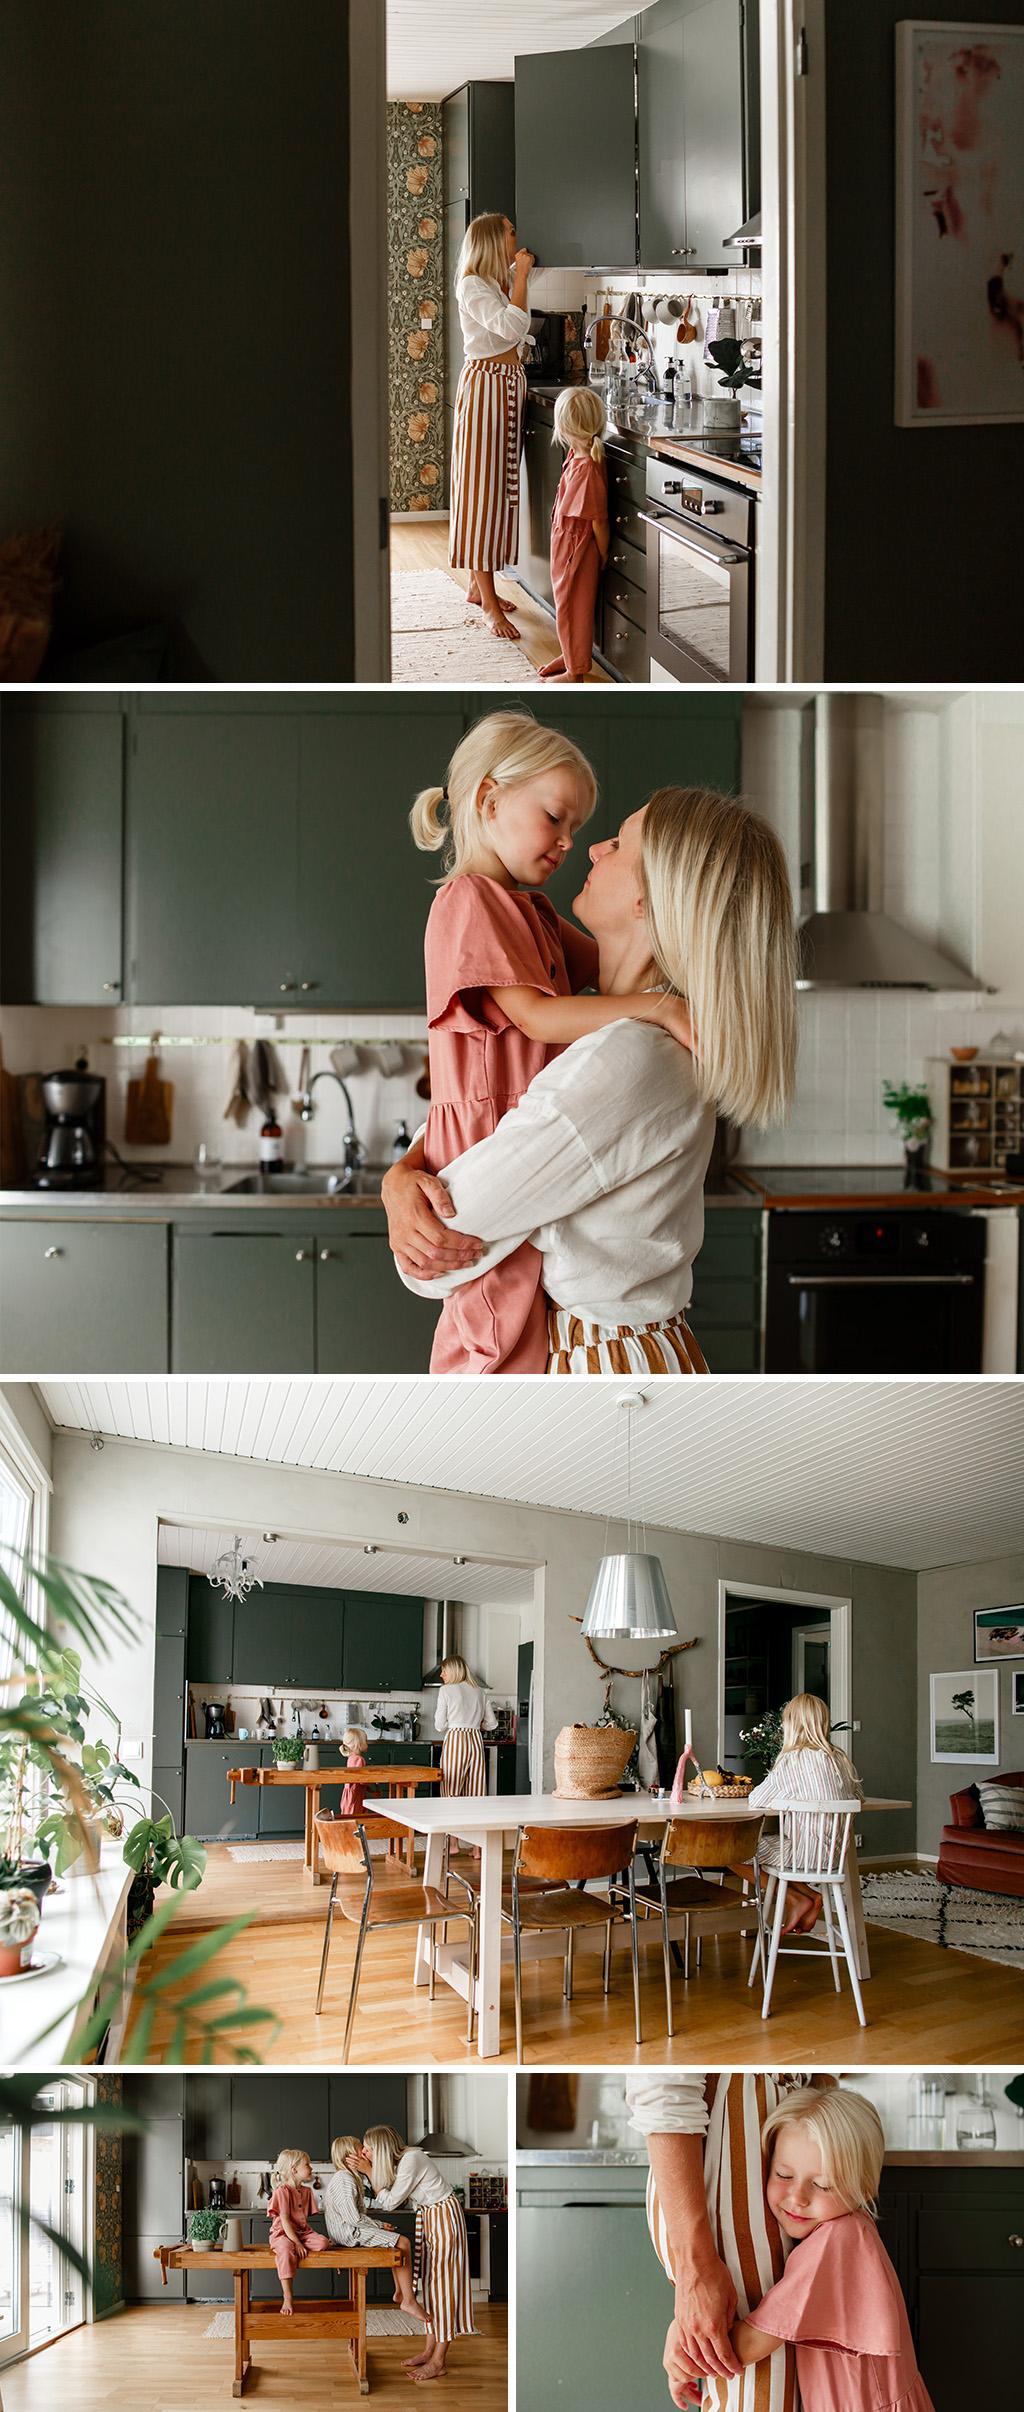 Lifestyle_familjefotografering_Stockholm_hemma-hos-fotografering_lifestyle-inhome-session_10.jpg